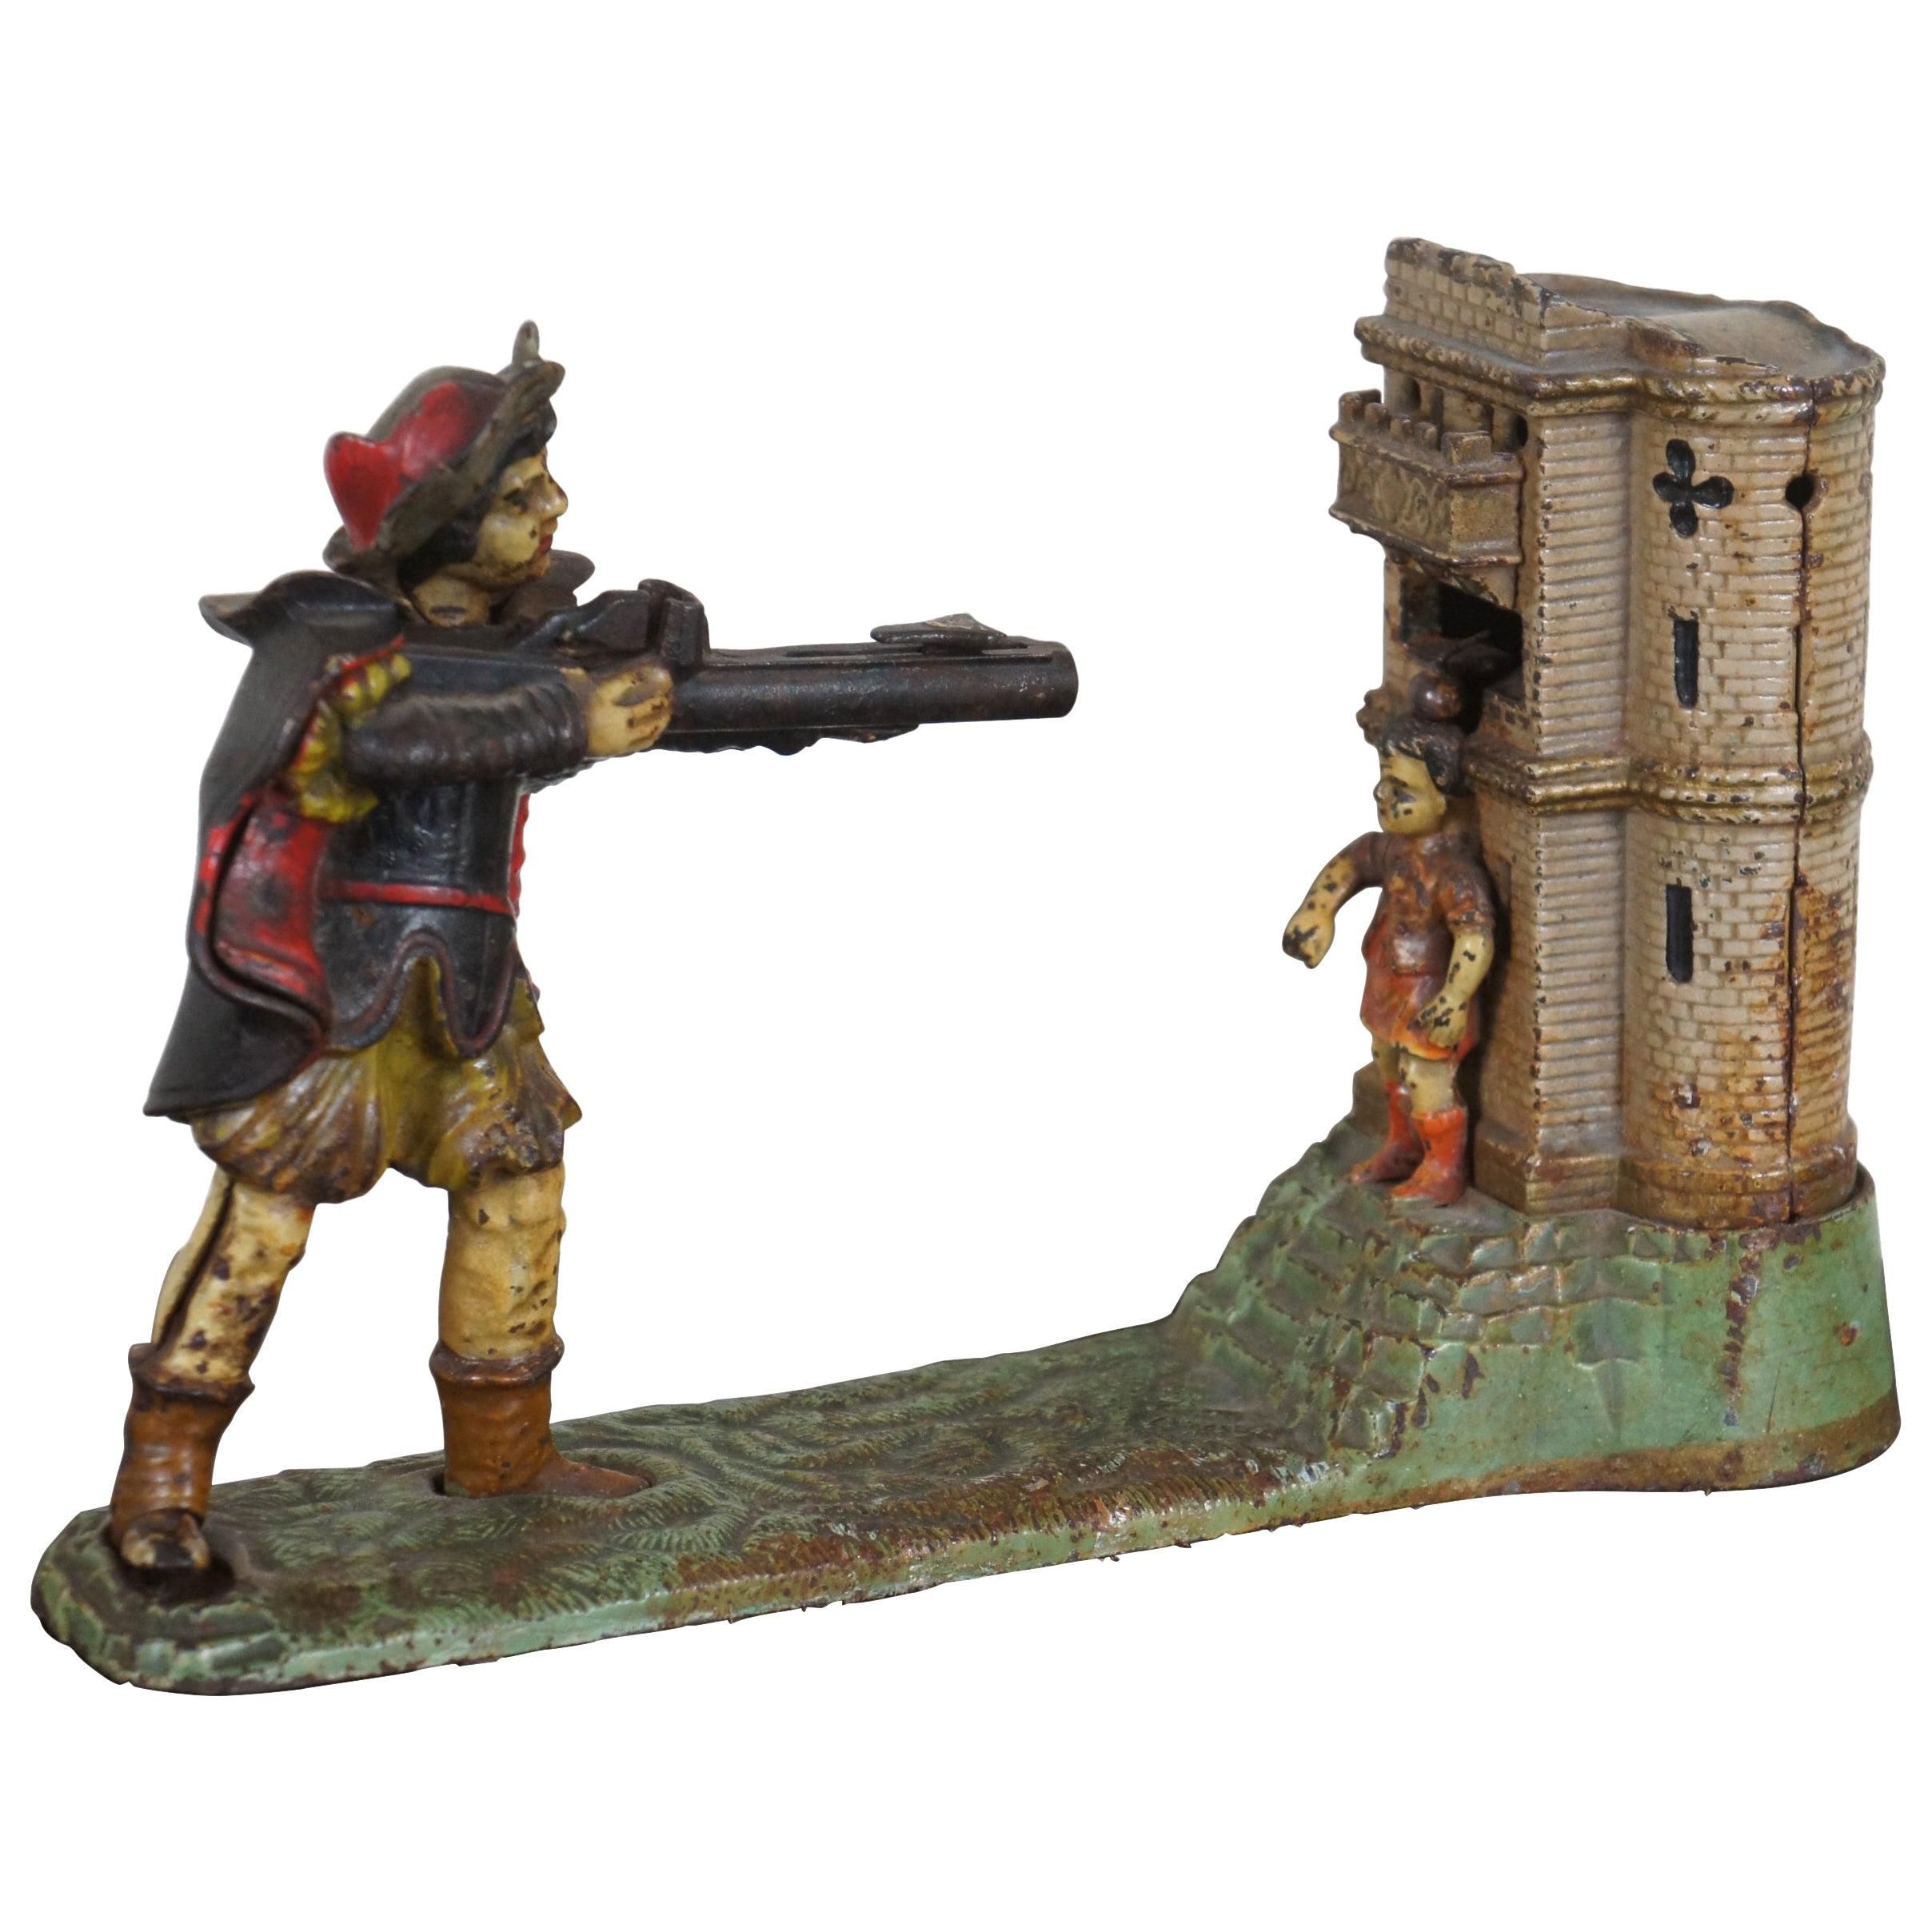 1896 Antique William Tell Cast Iron Mechanical Bank J&E Stevens Americana Toy